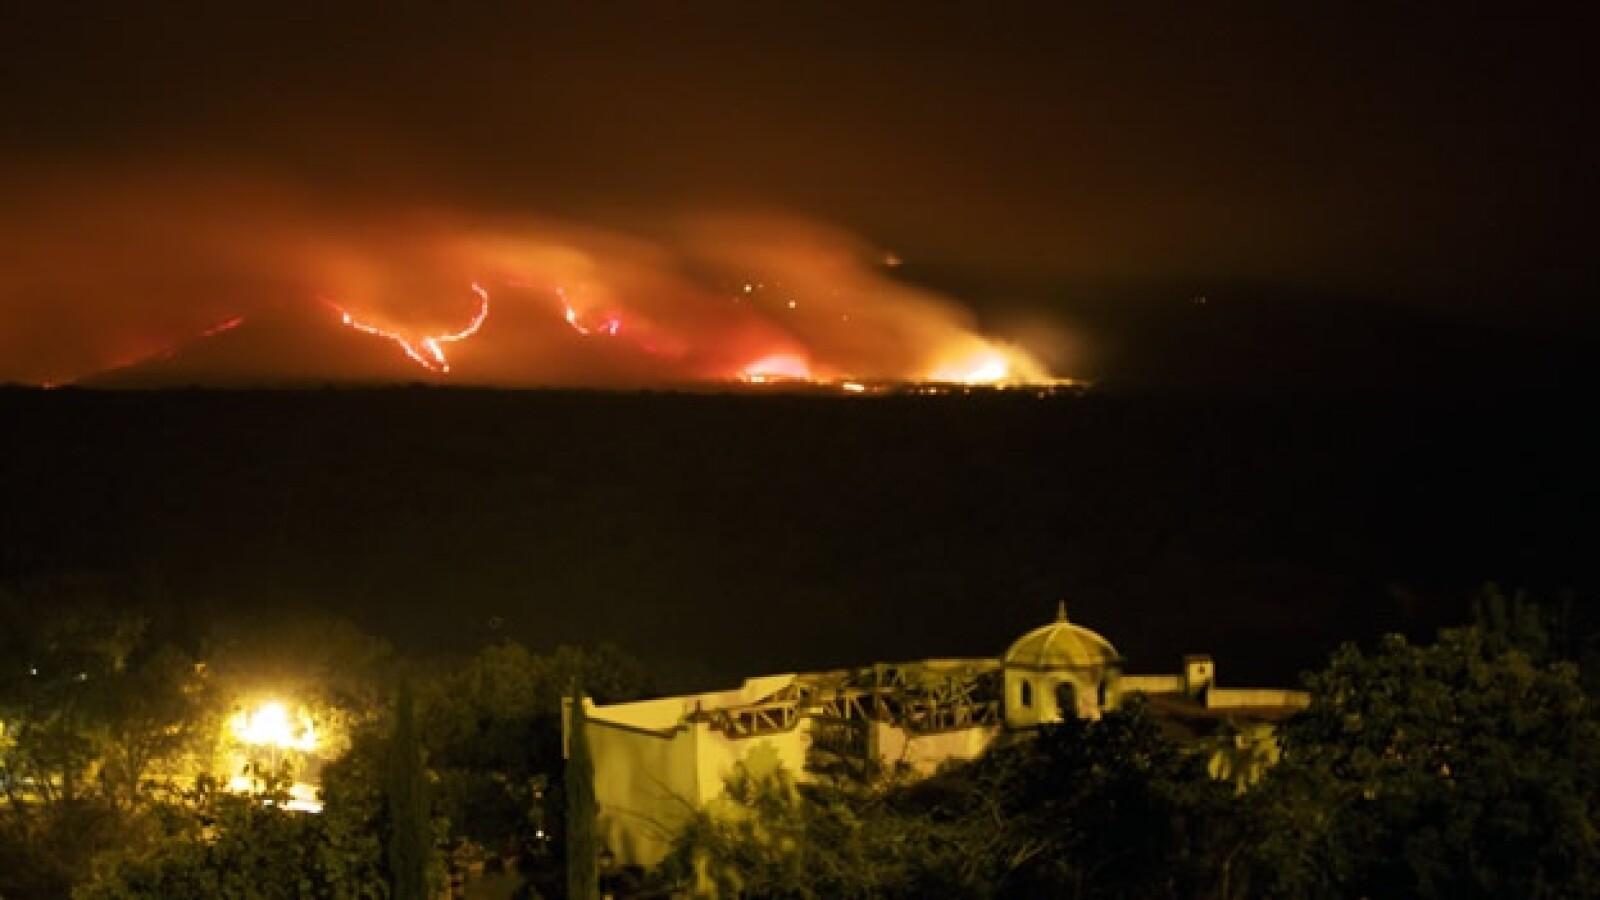 incendio La primavera guadalajara 1